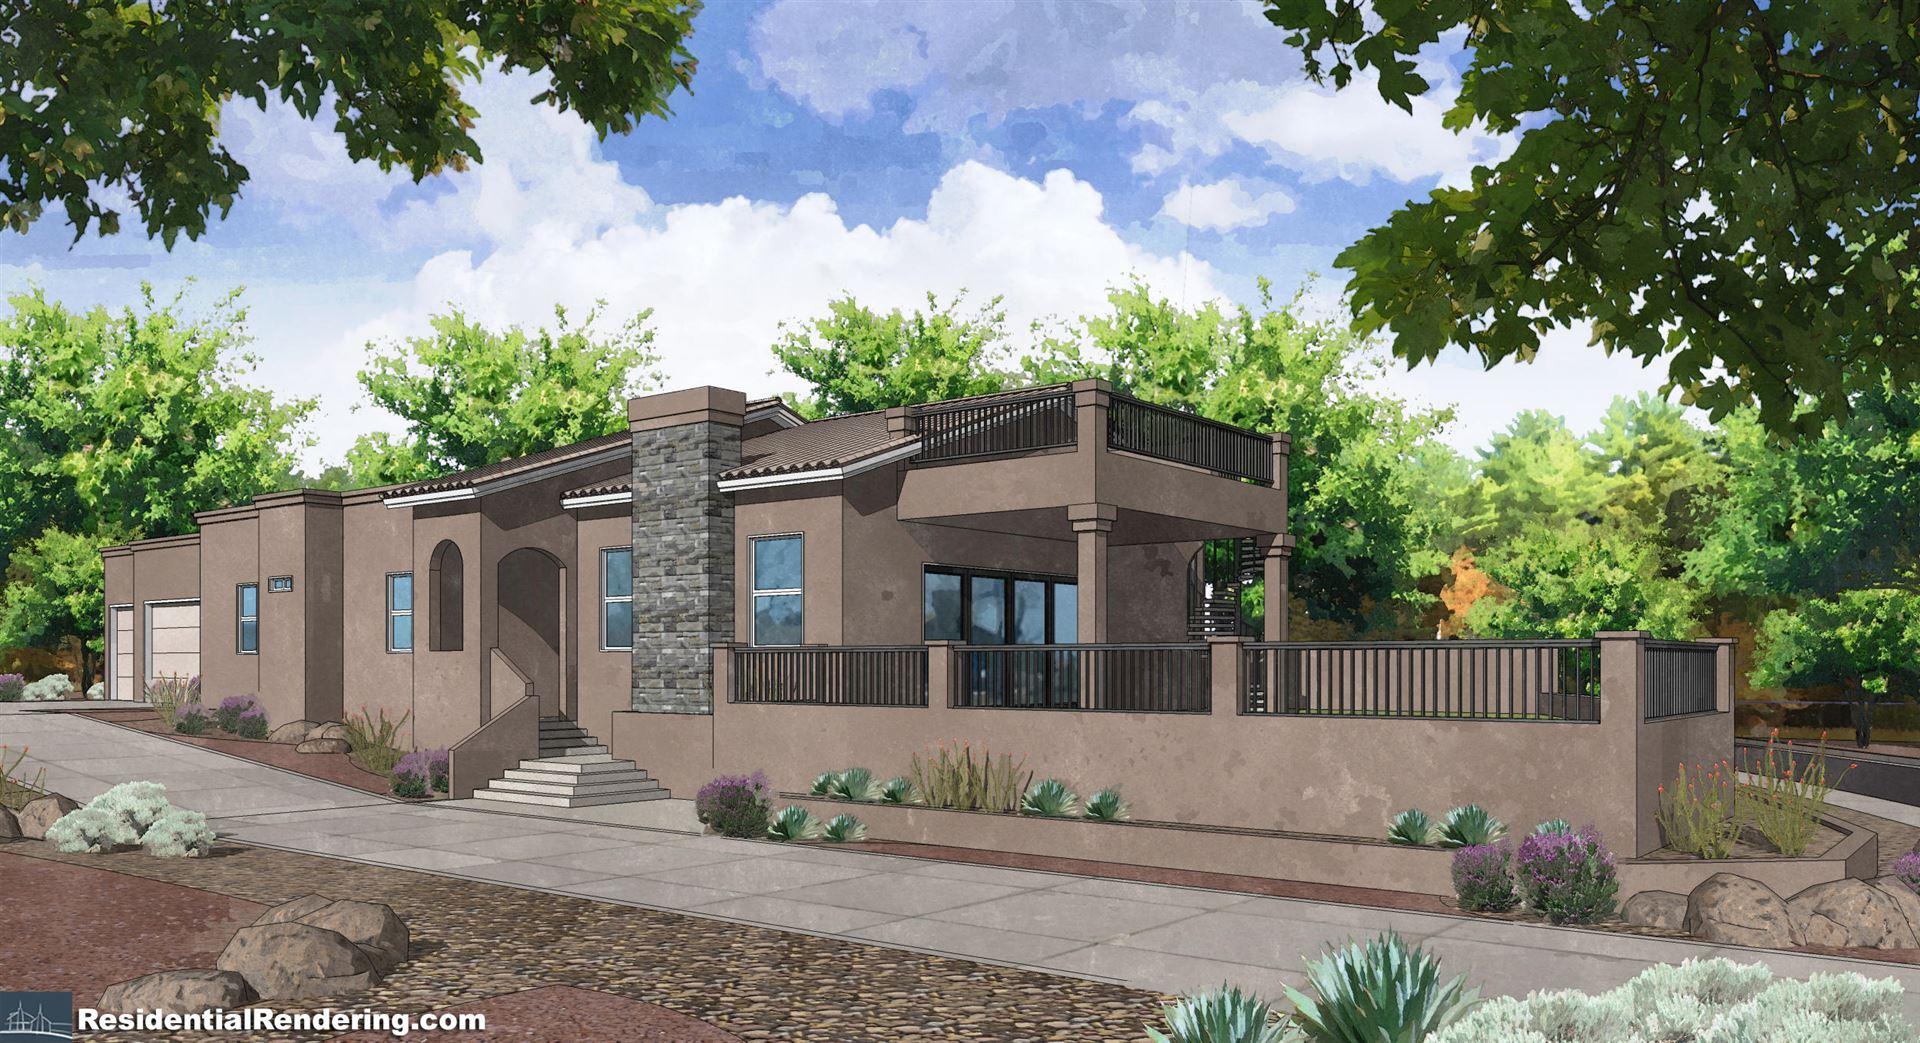 6063 Redondo Sierra NE, Rio Rancho, NM 87144 - MLS#: 974165